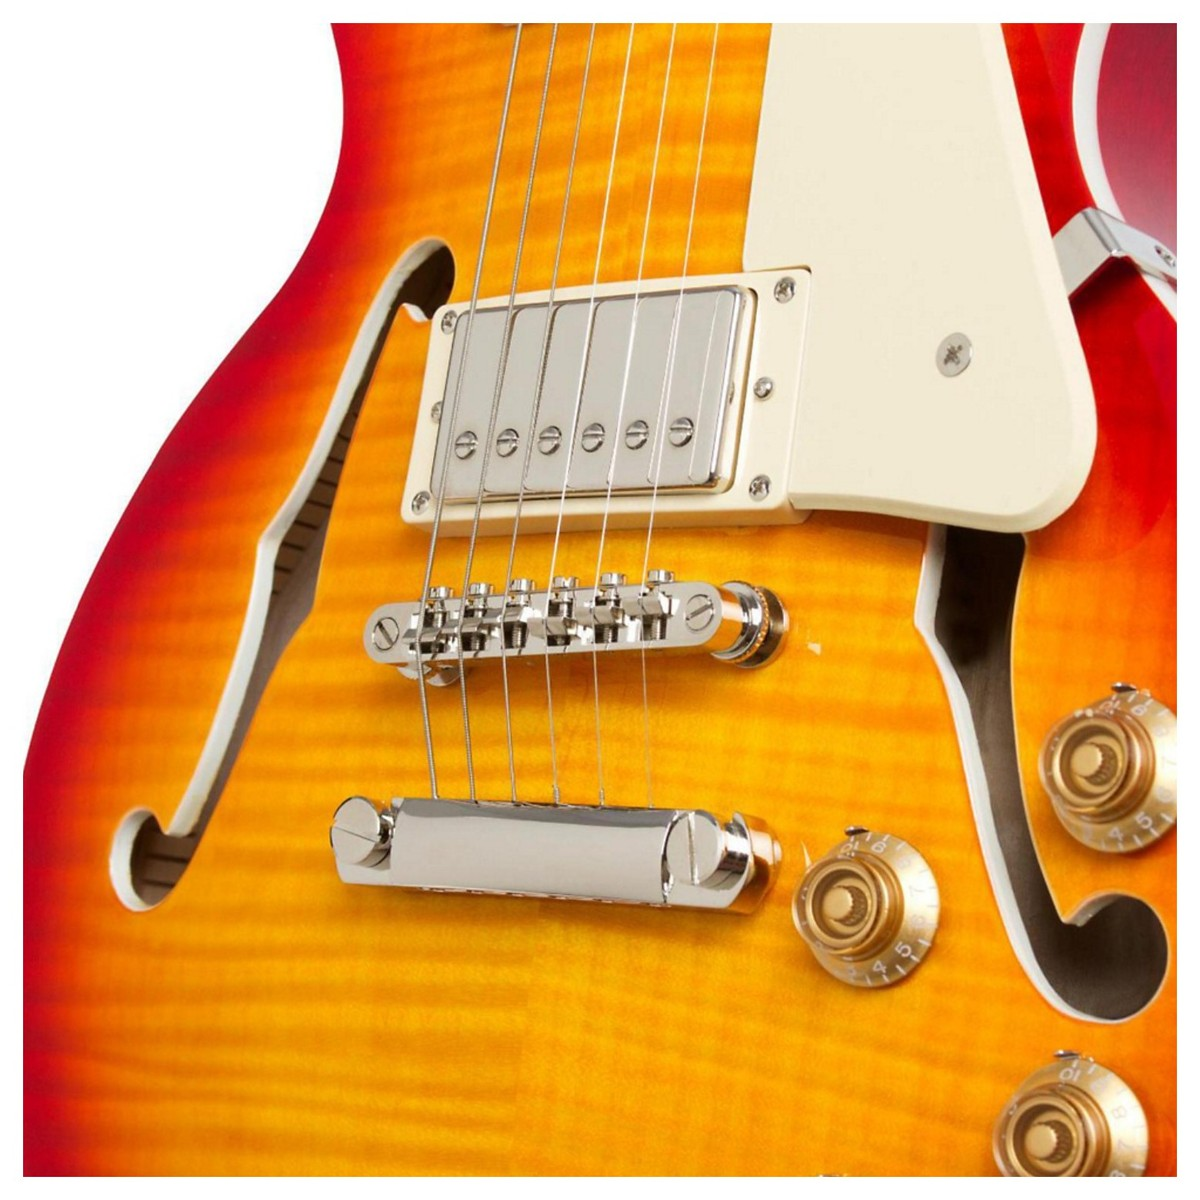 epiphone les paul es pro hollowbody guitar faded cherry burst at. Black Bedroom Furniture Sets. Home Design Ideas